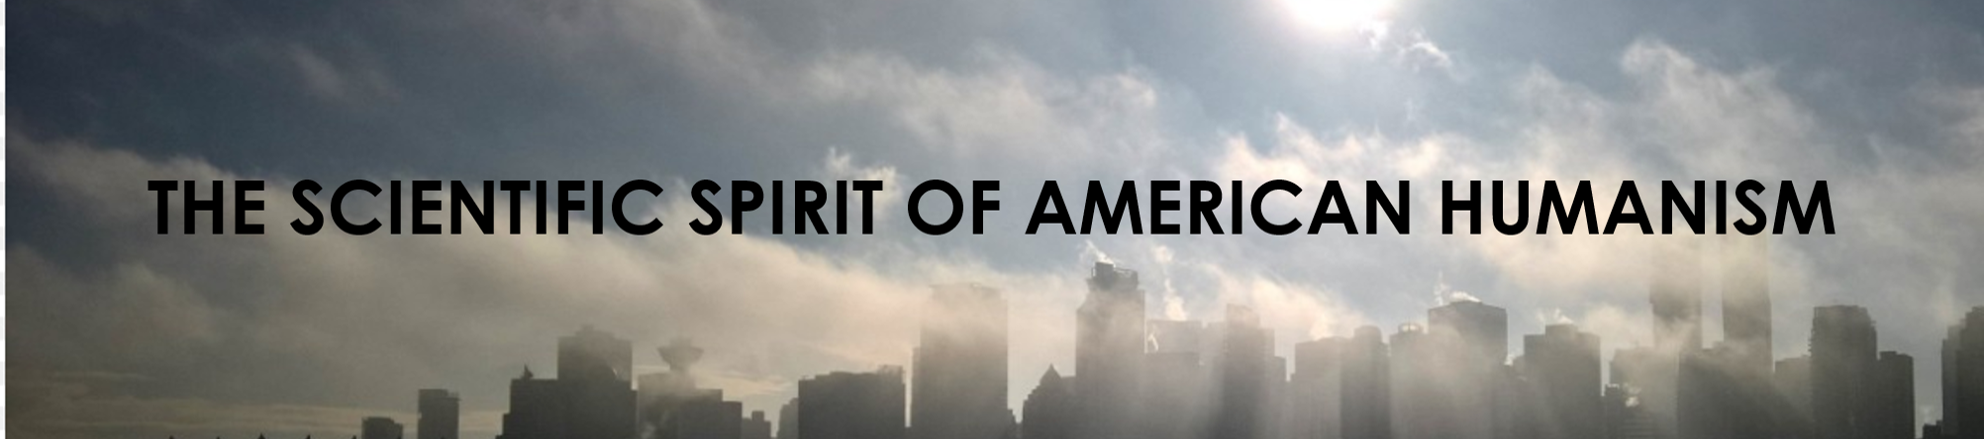 The Scientific Spirit of American Humanism